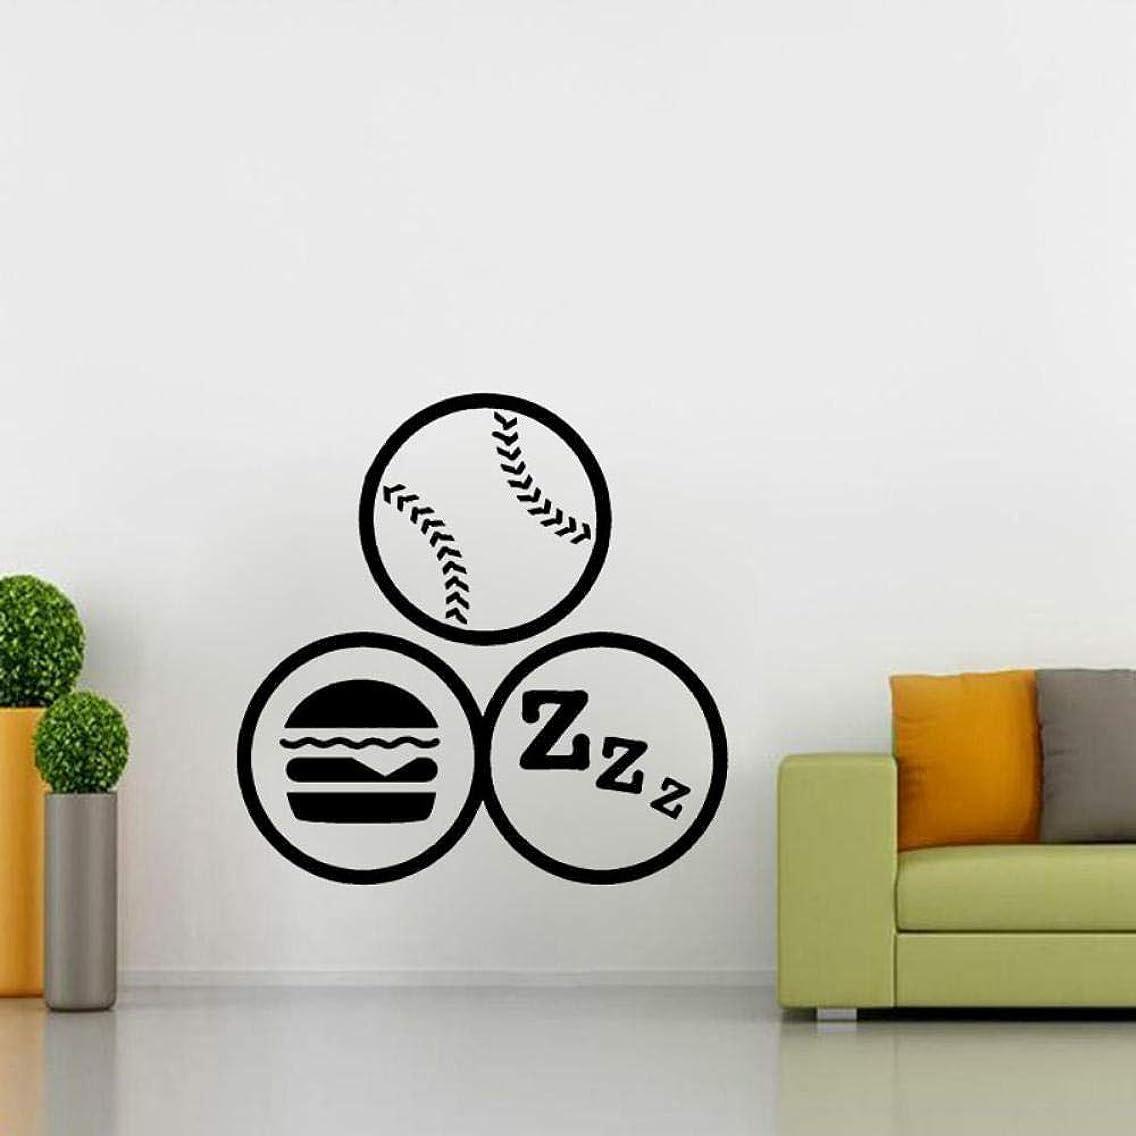 Wall Stickers Murals 55.3Cmx55.3Cm Interesting Eat Sleep Baseball Wall Decal PVC Decor Gym Boys Kids Room